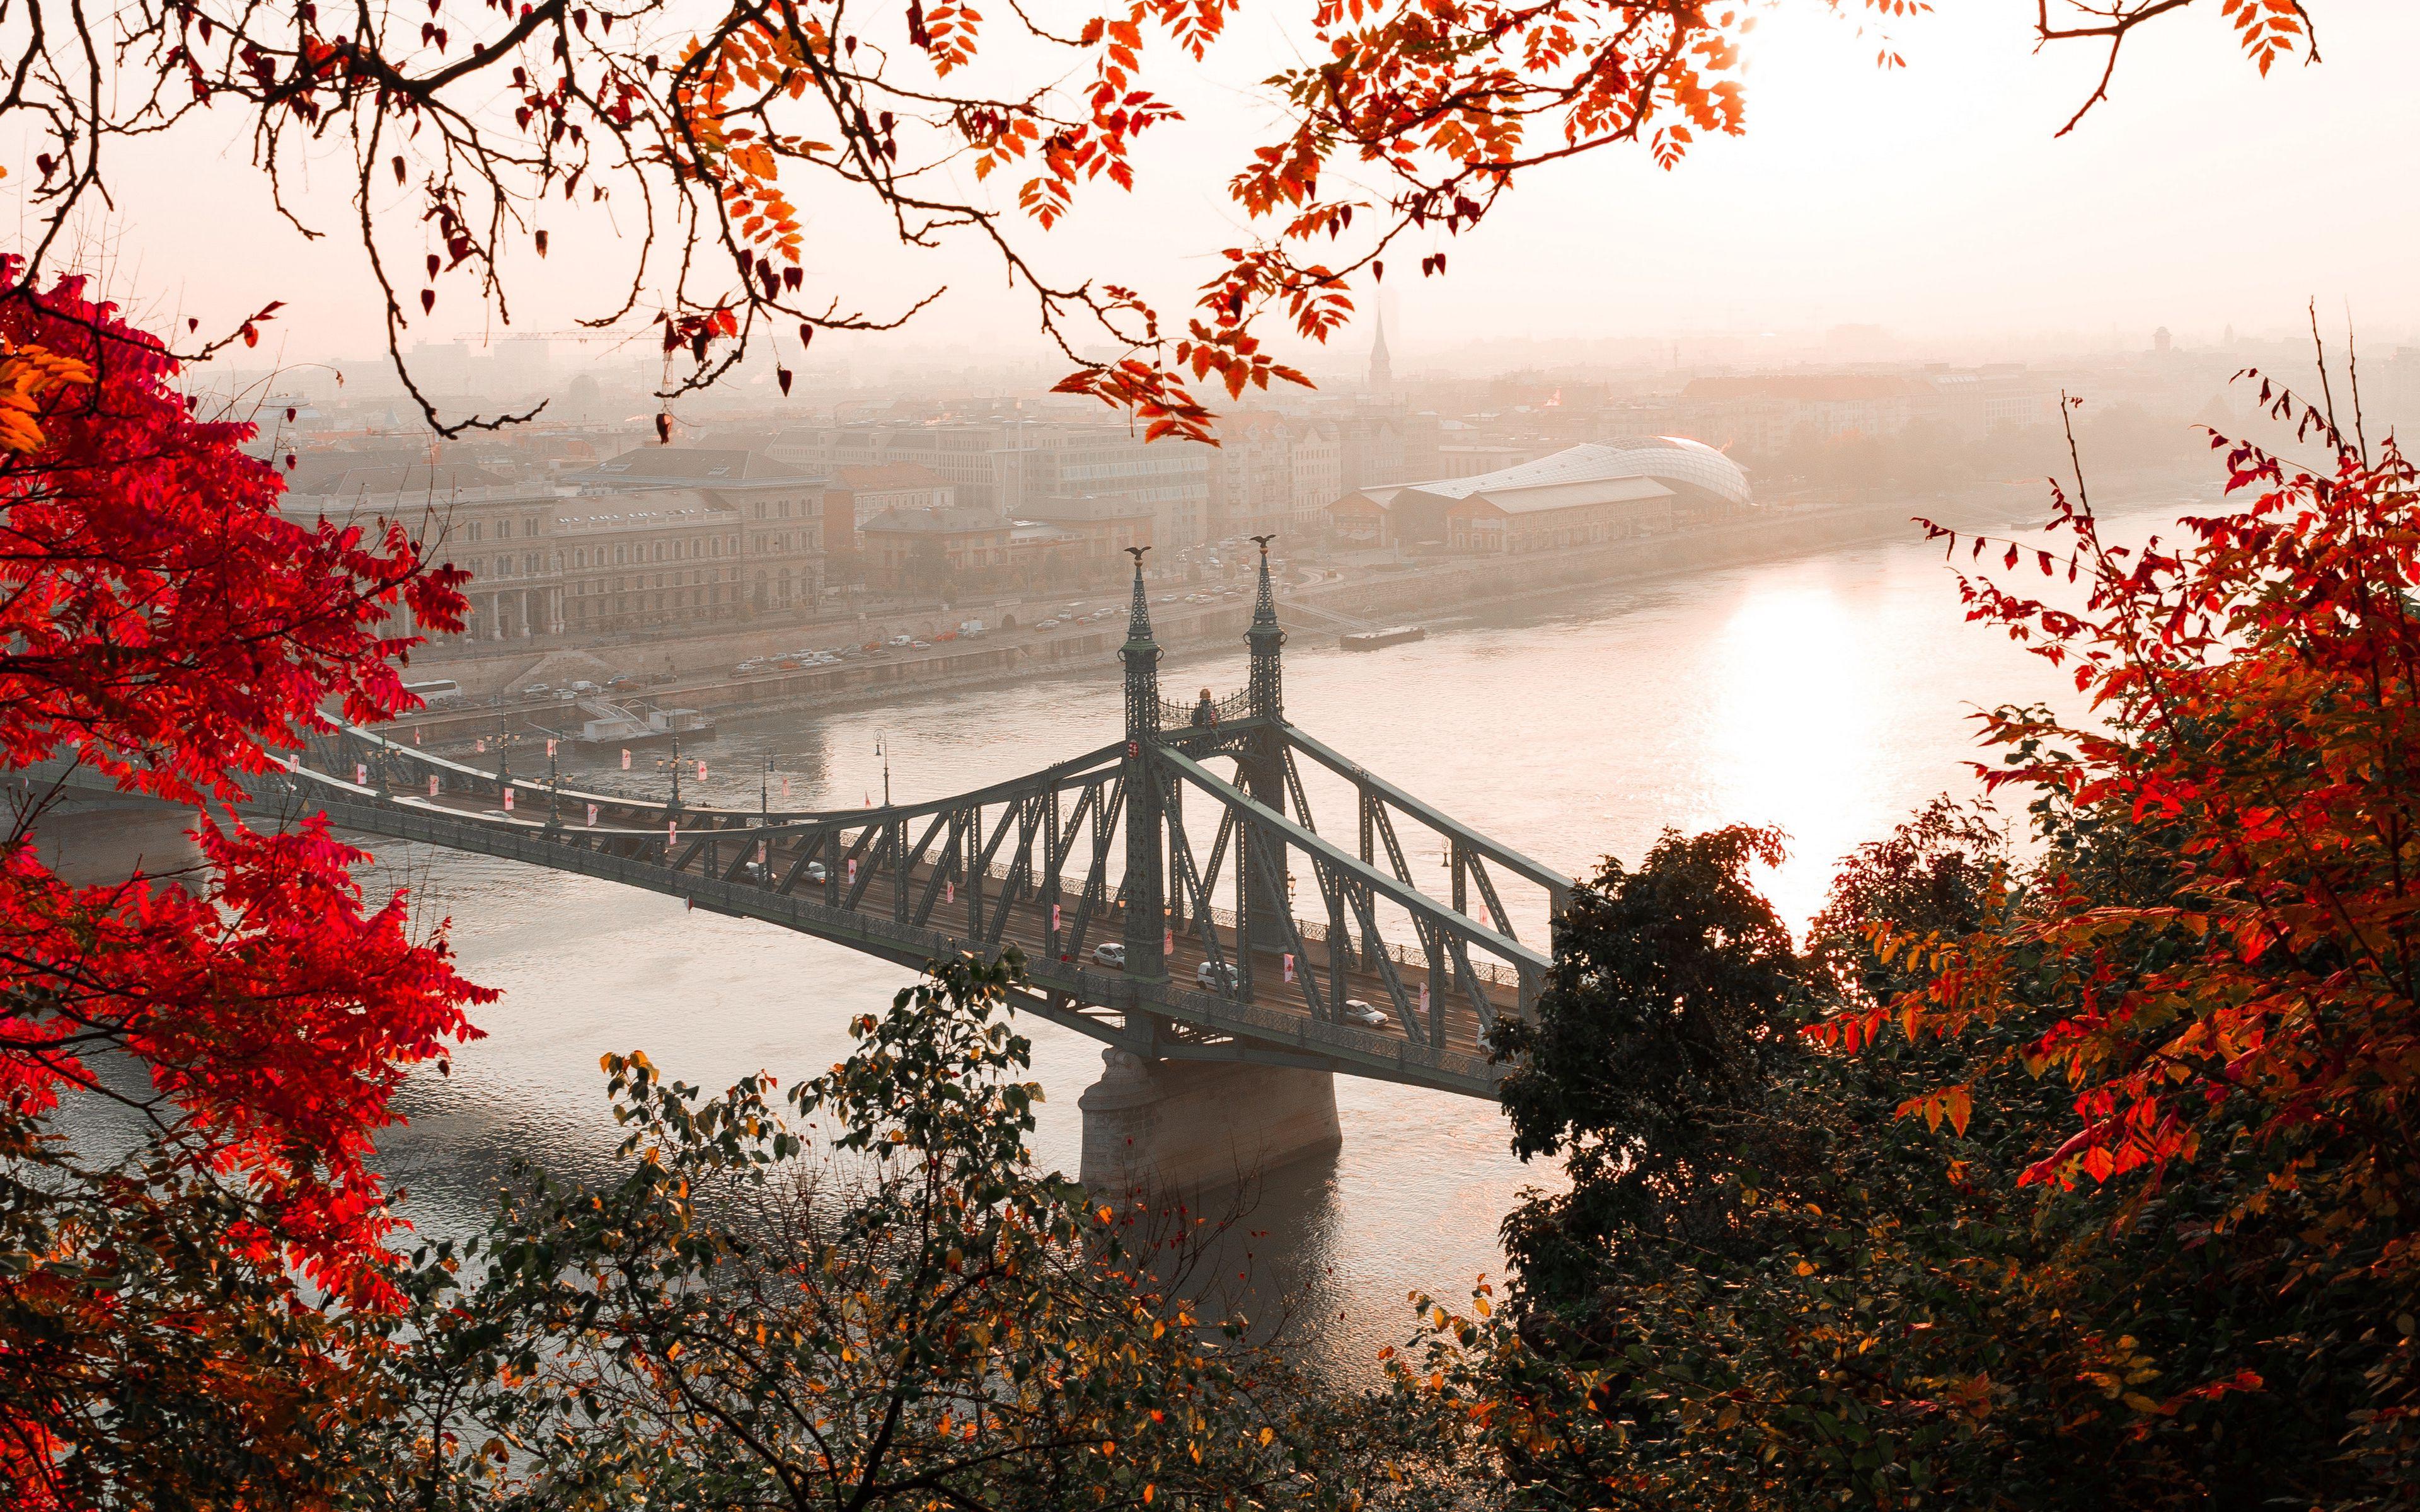 3840x2400 Wallpaper bridge, autumn, city, citadella, budapest, hungary